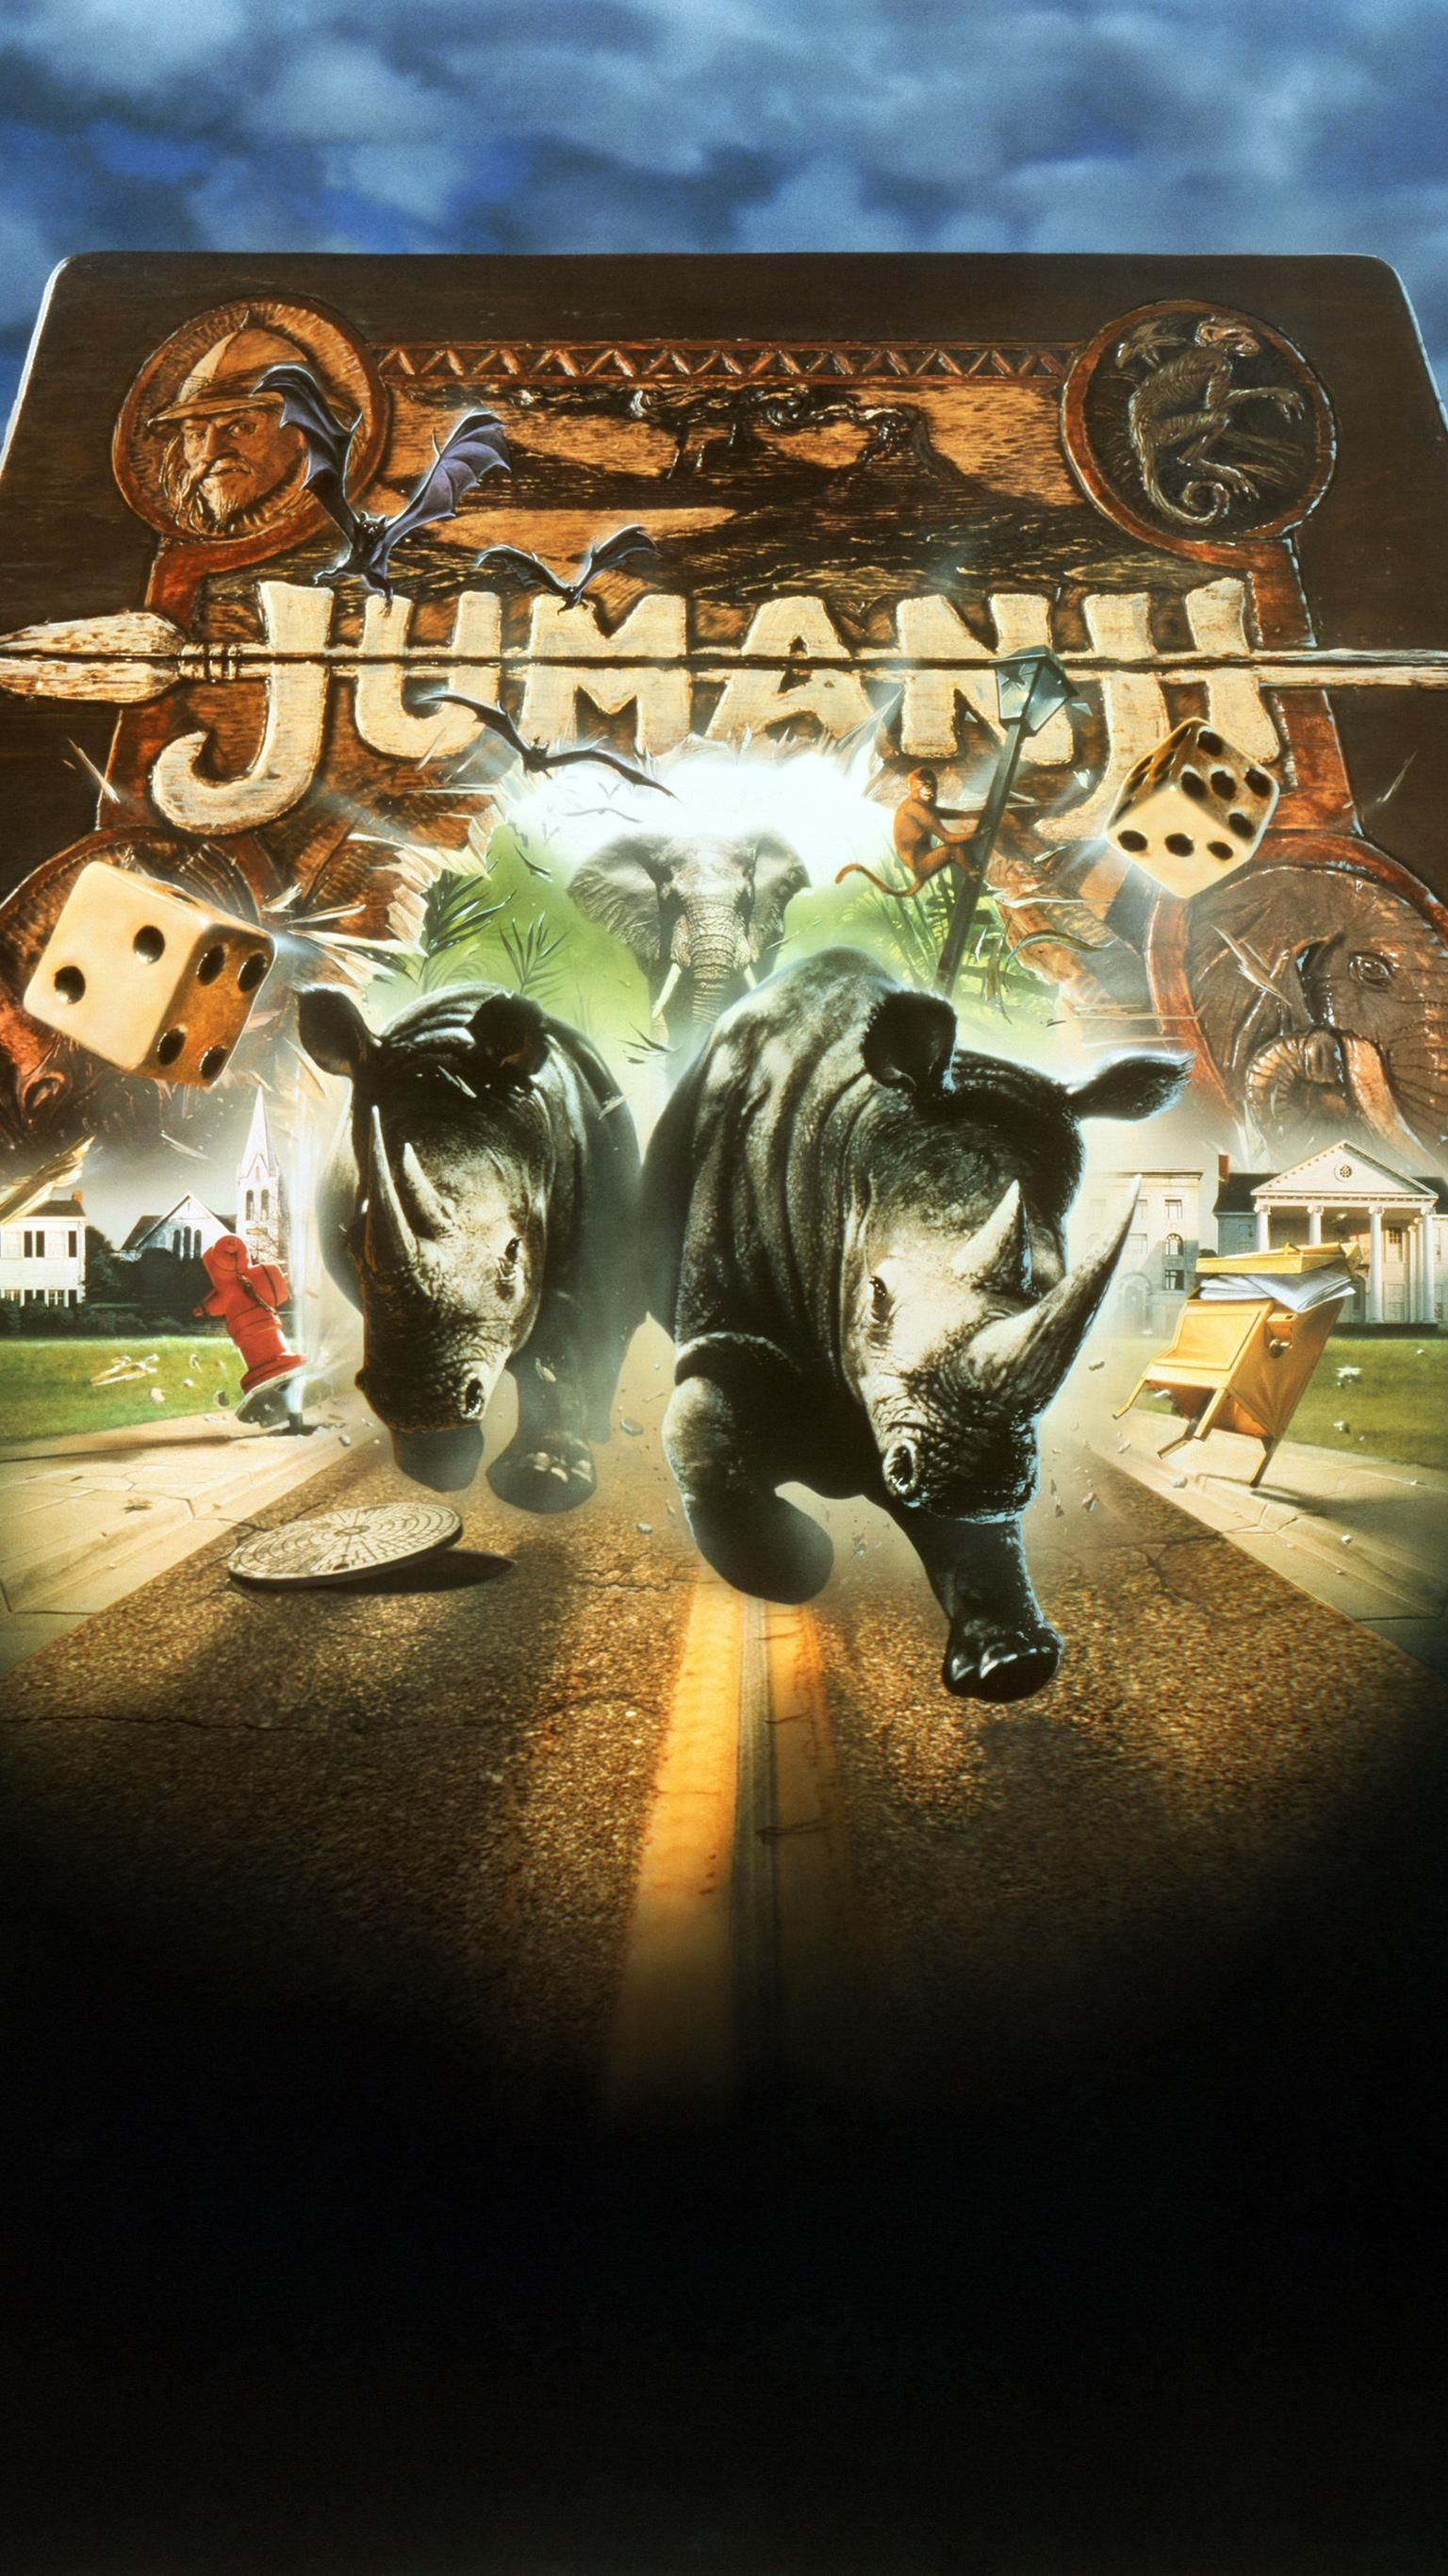 Jumanji 1995 Phone Wallpaper Moviemania Filmes Completos Filmes Hd 1080p